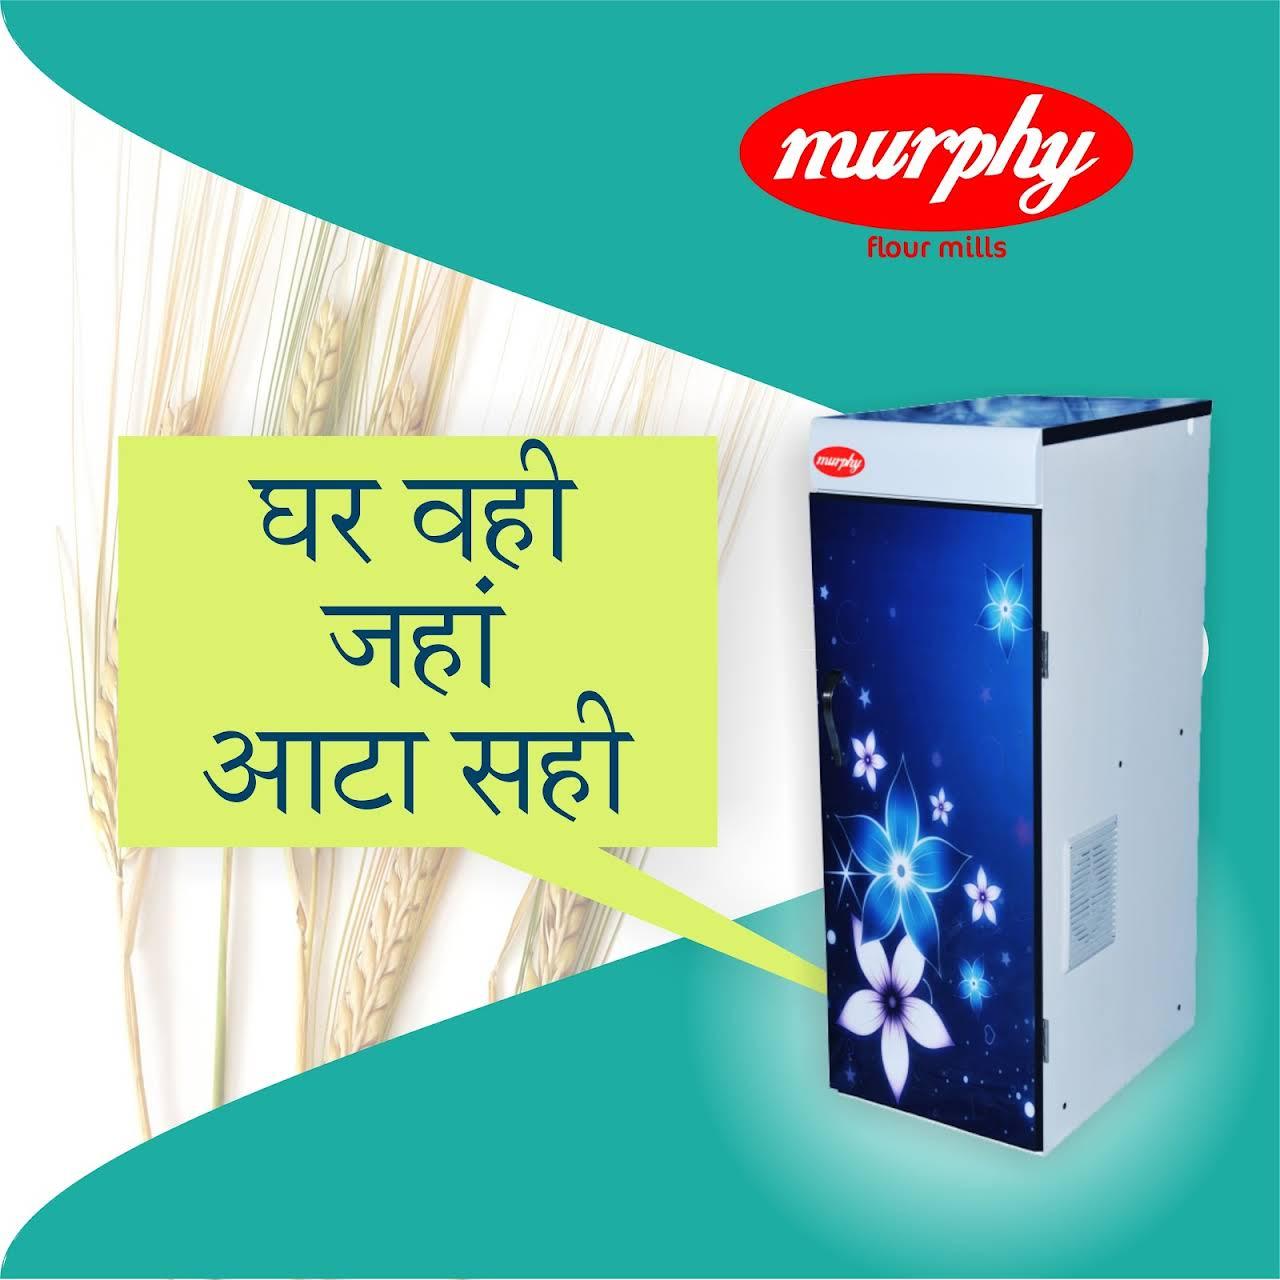 murphy flour mills atta maker atta chakki gharghanti chakki - flour